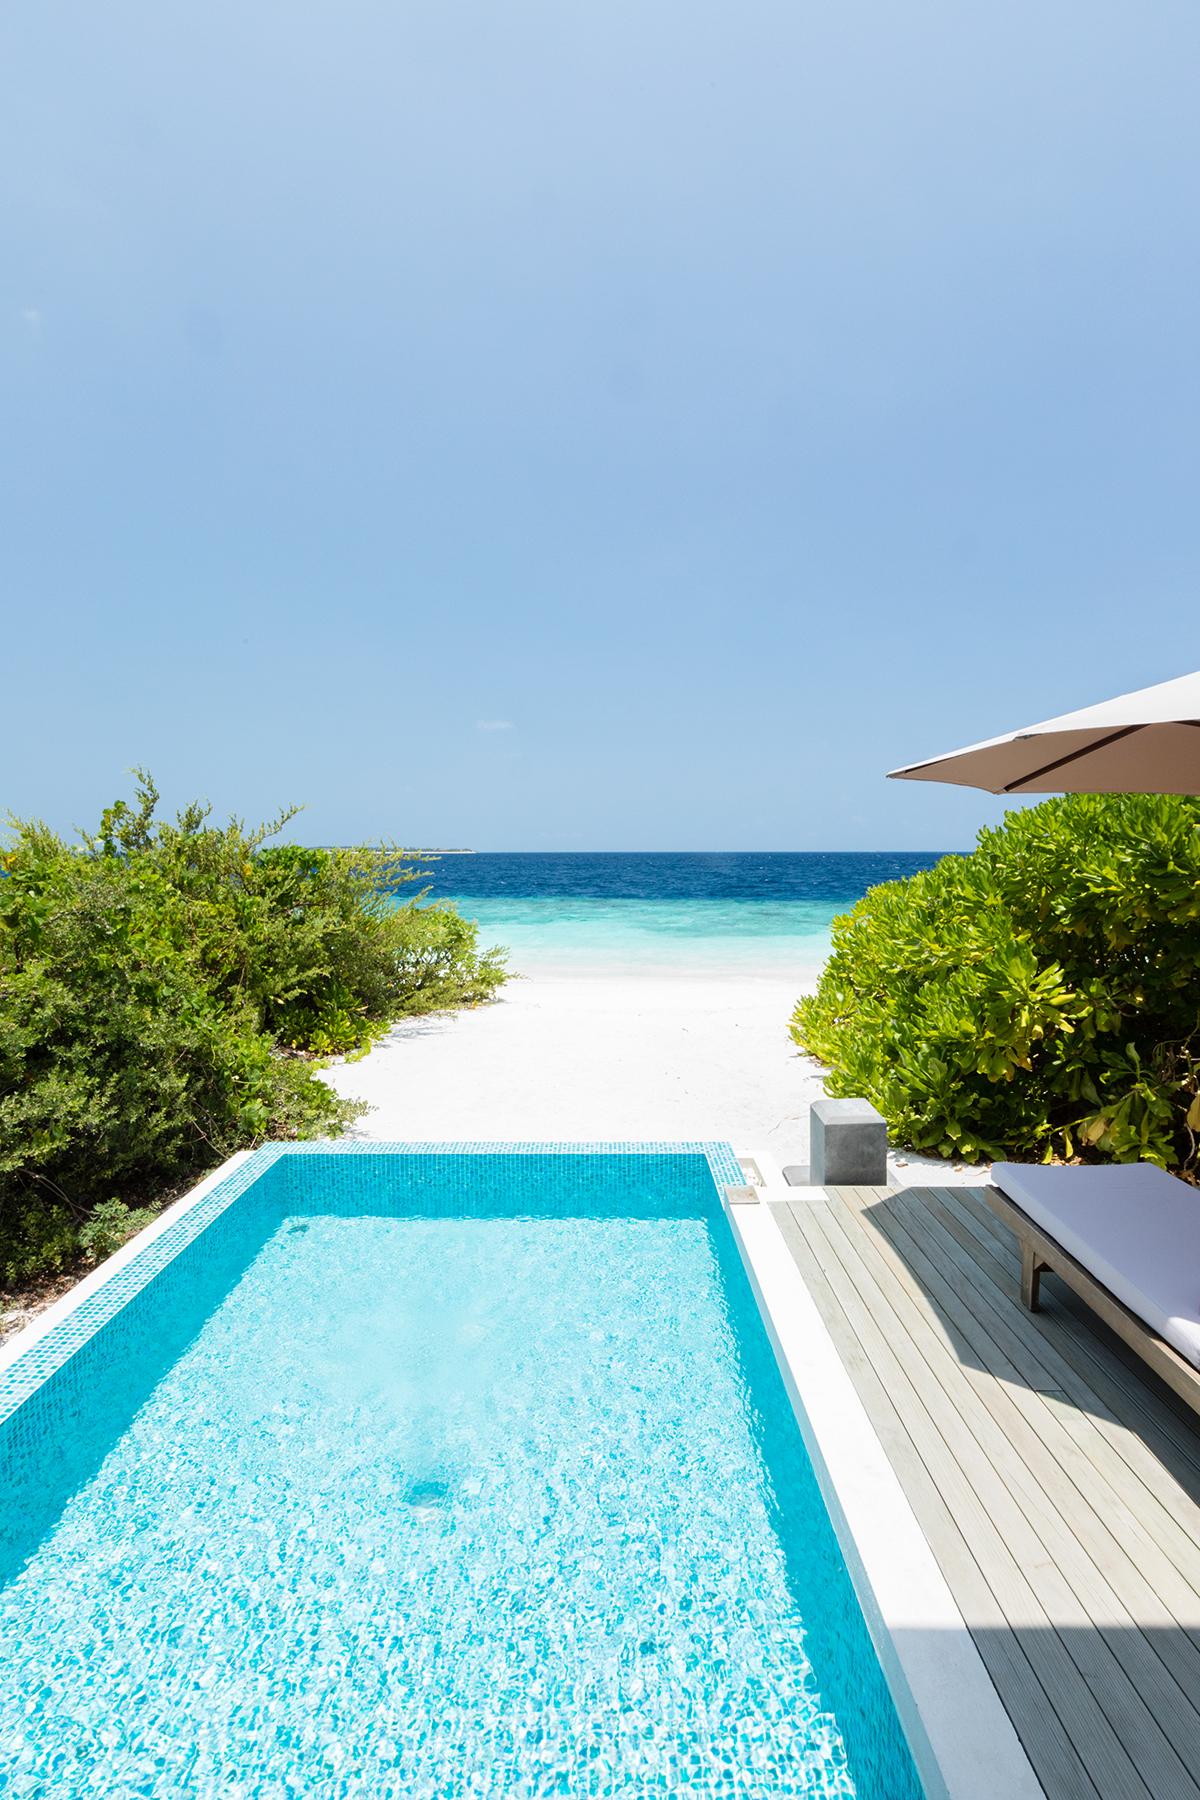 Beach Villa with pool Dhigali Maldives